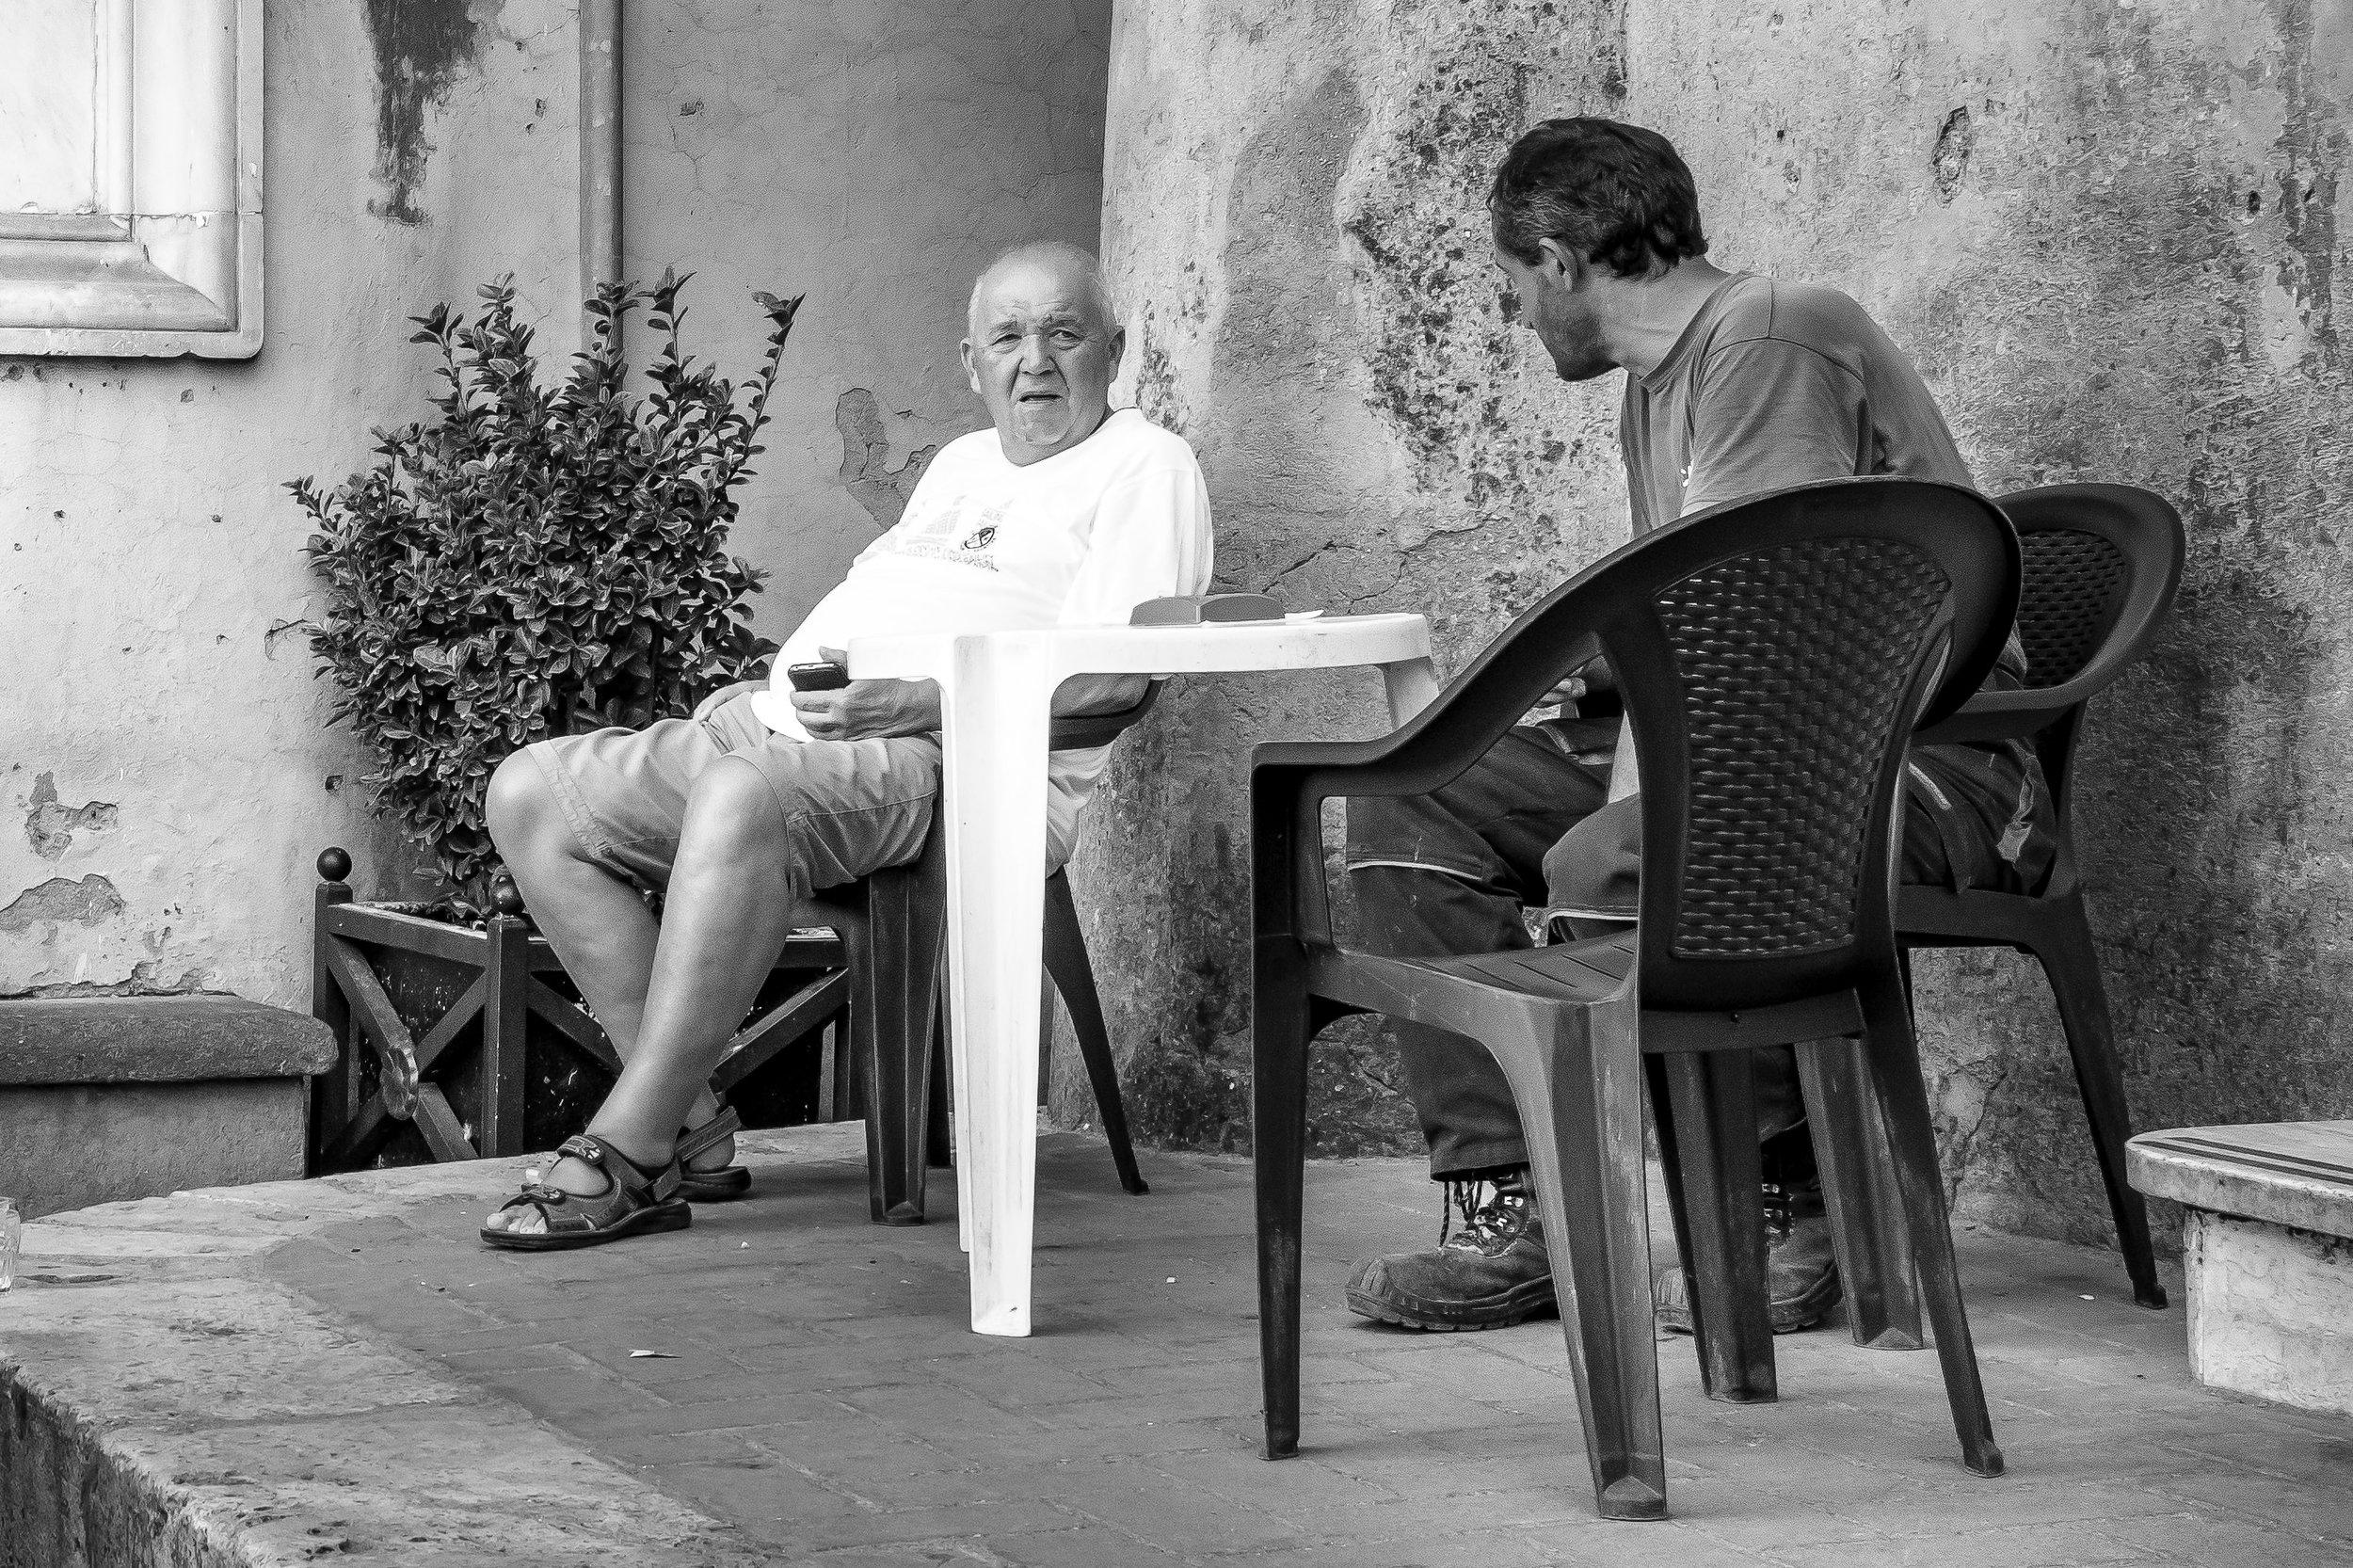 viewfinder-straatfotografie-oude-mannen-in-Collevecchio-12.jpg